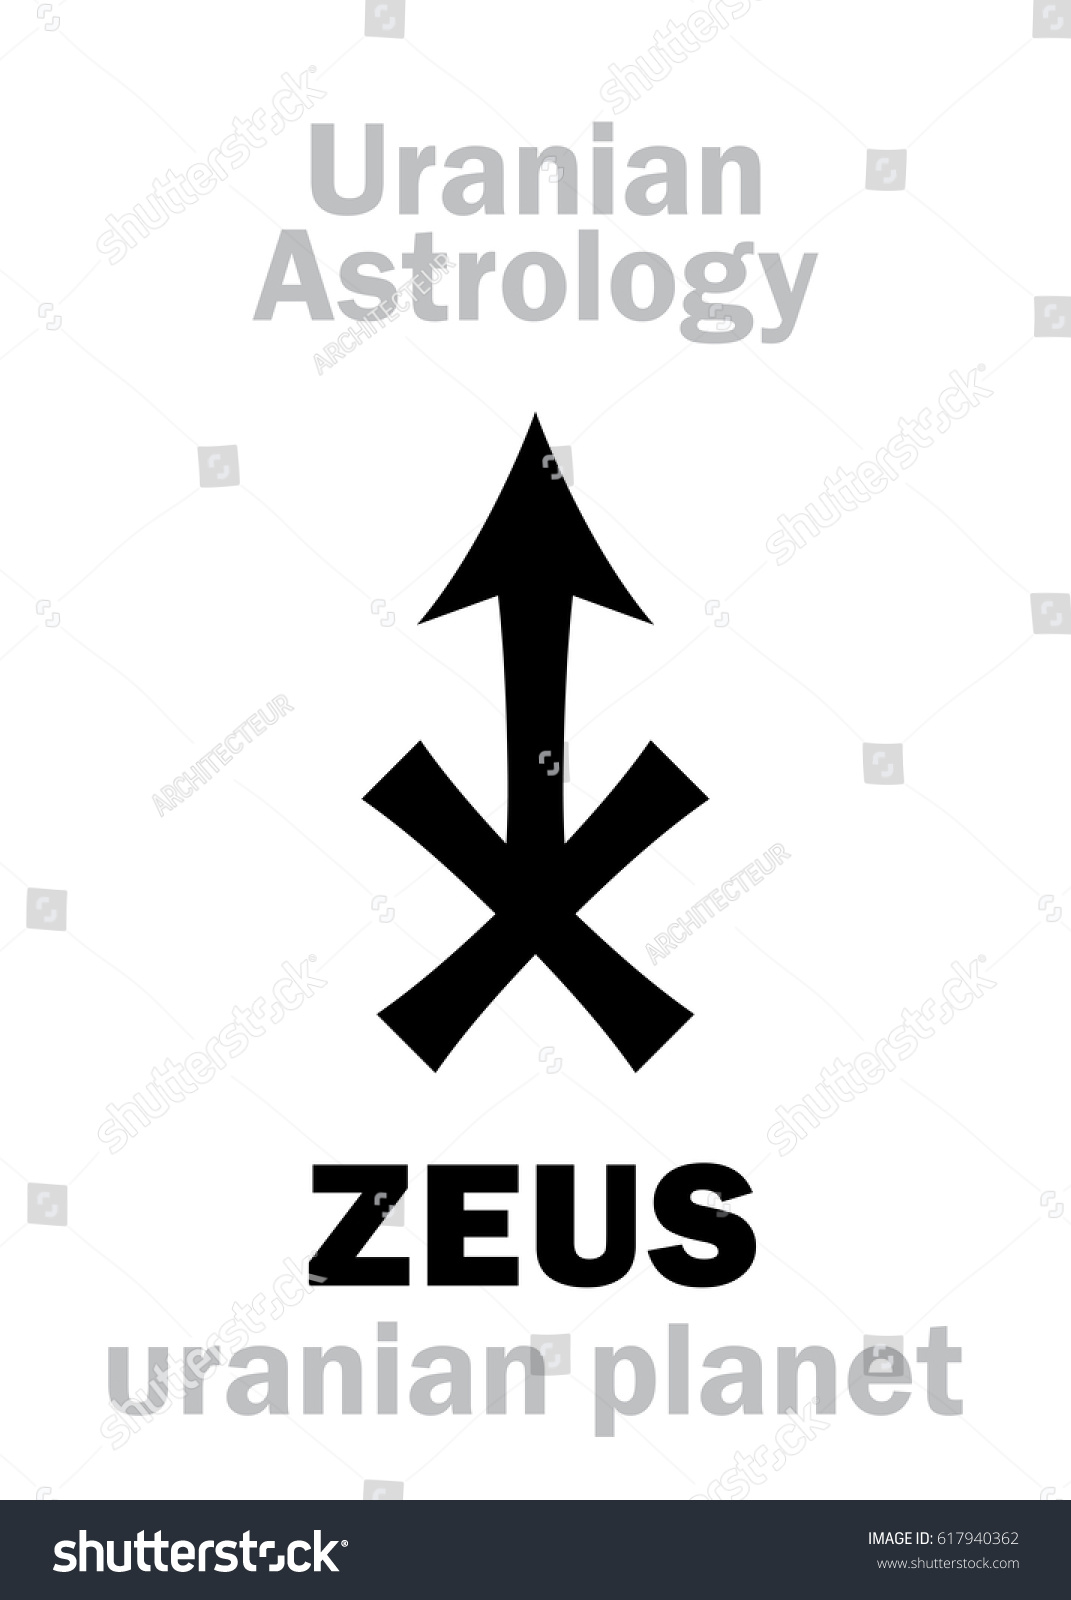 Astrology alphabet zeus uranian planet transneptunian stock vector astrology alphabet zeus uranian planet trans neptunian point hieroglyphics character biocorpaavc Images